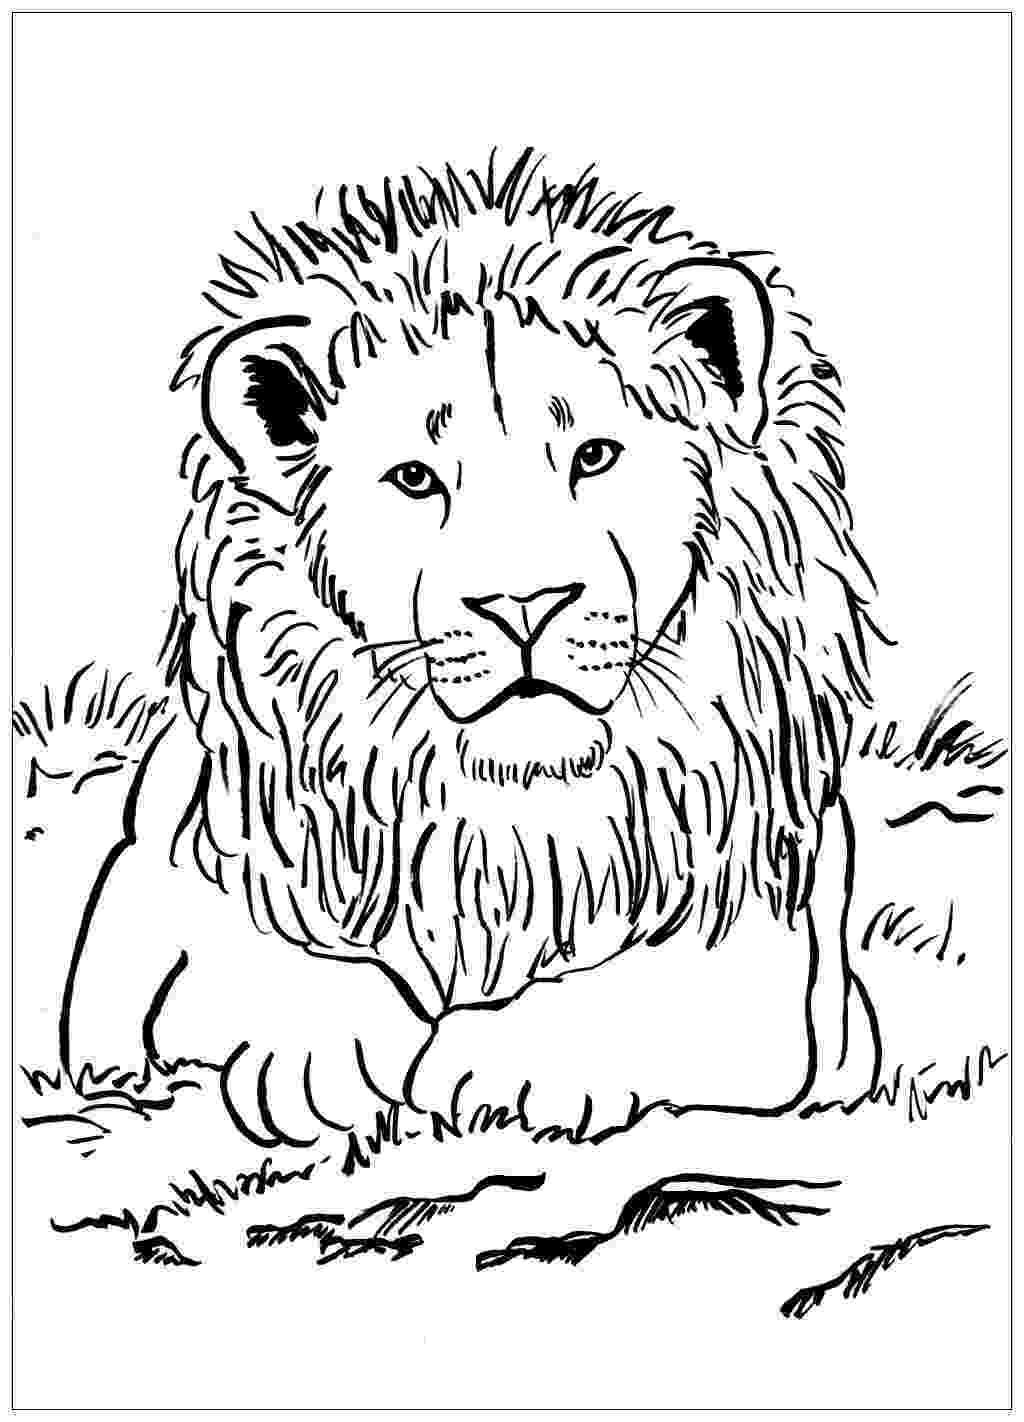 pictures of lions to color lion coloring pages lion coloring pages lion coloring to of pictures color lions